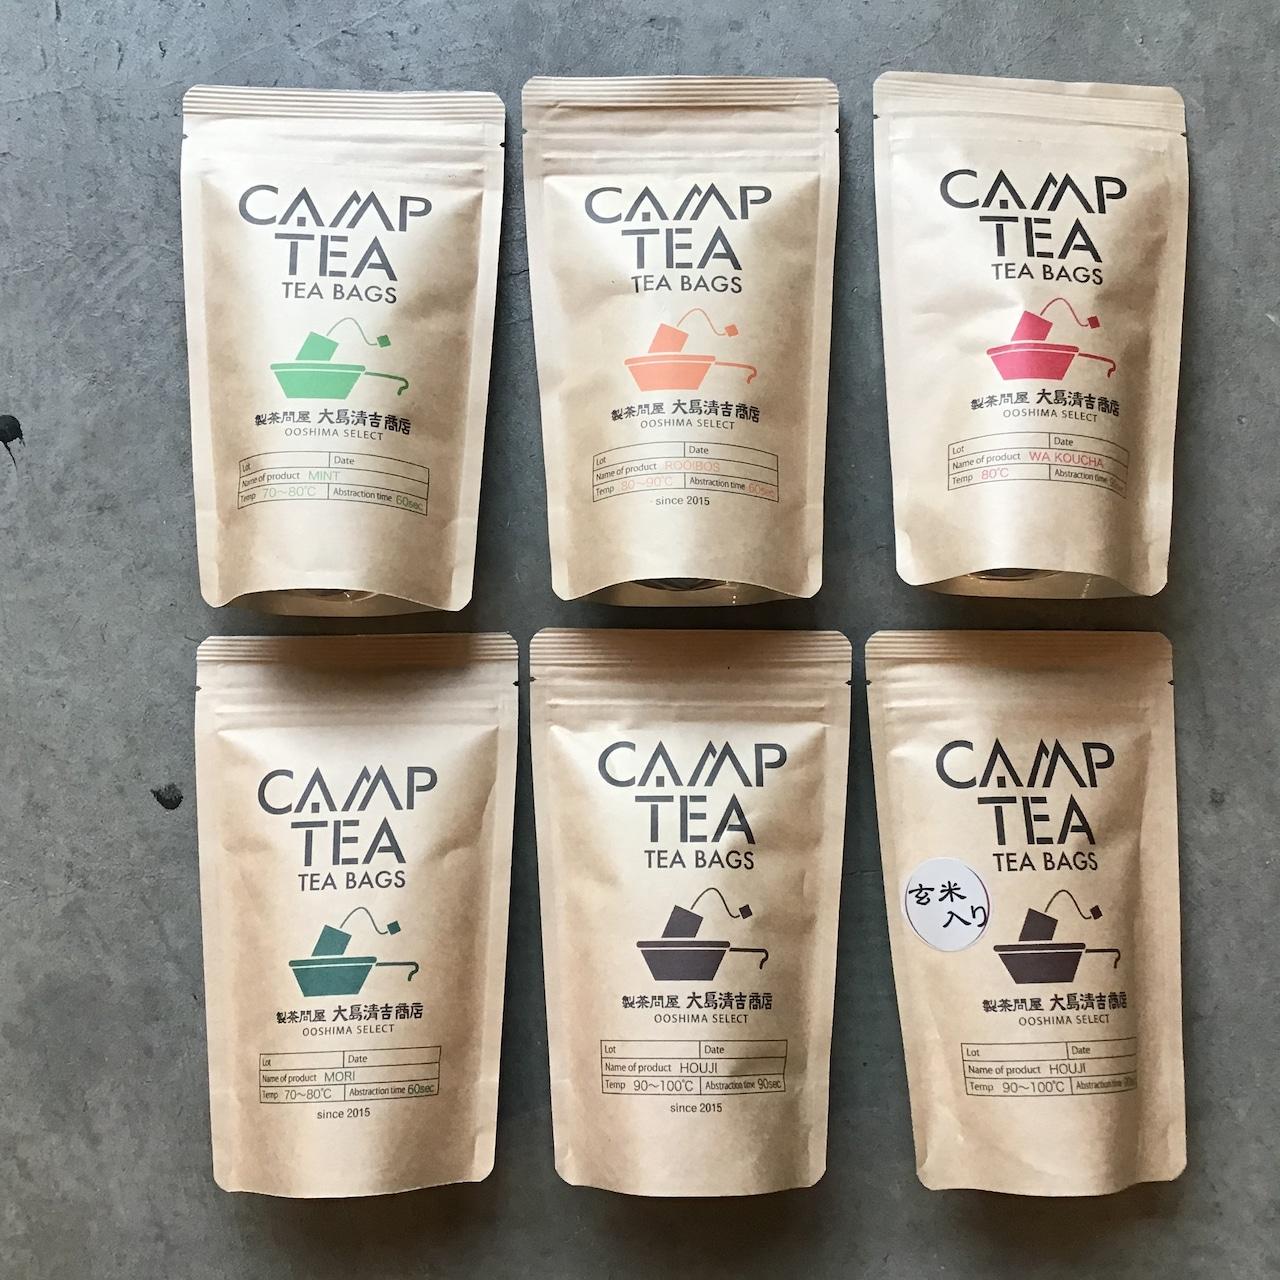 CAMP TEA